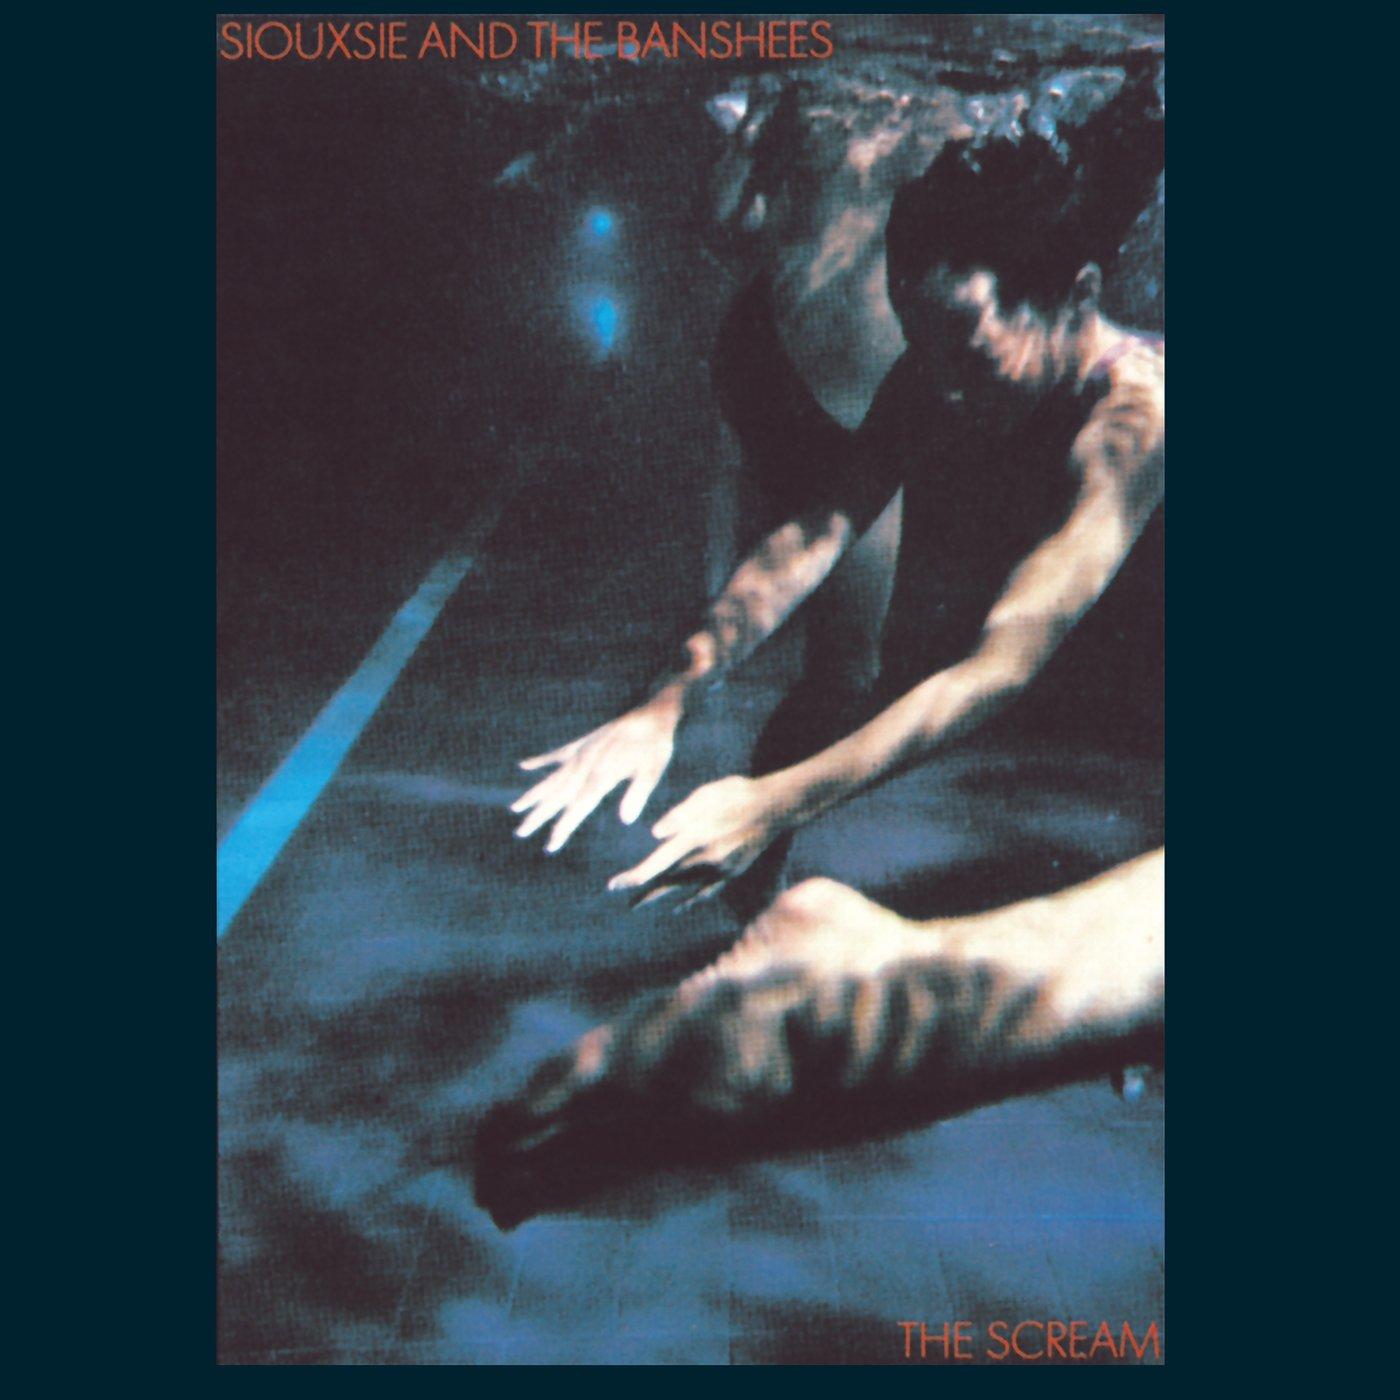 Vinilo : Siouxsie & Banshees - The Scream (180 Gram Vinyl)